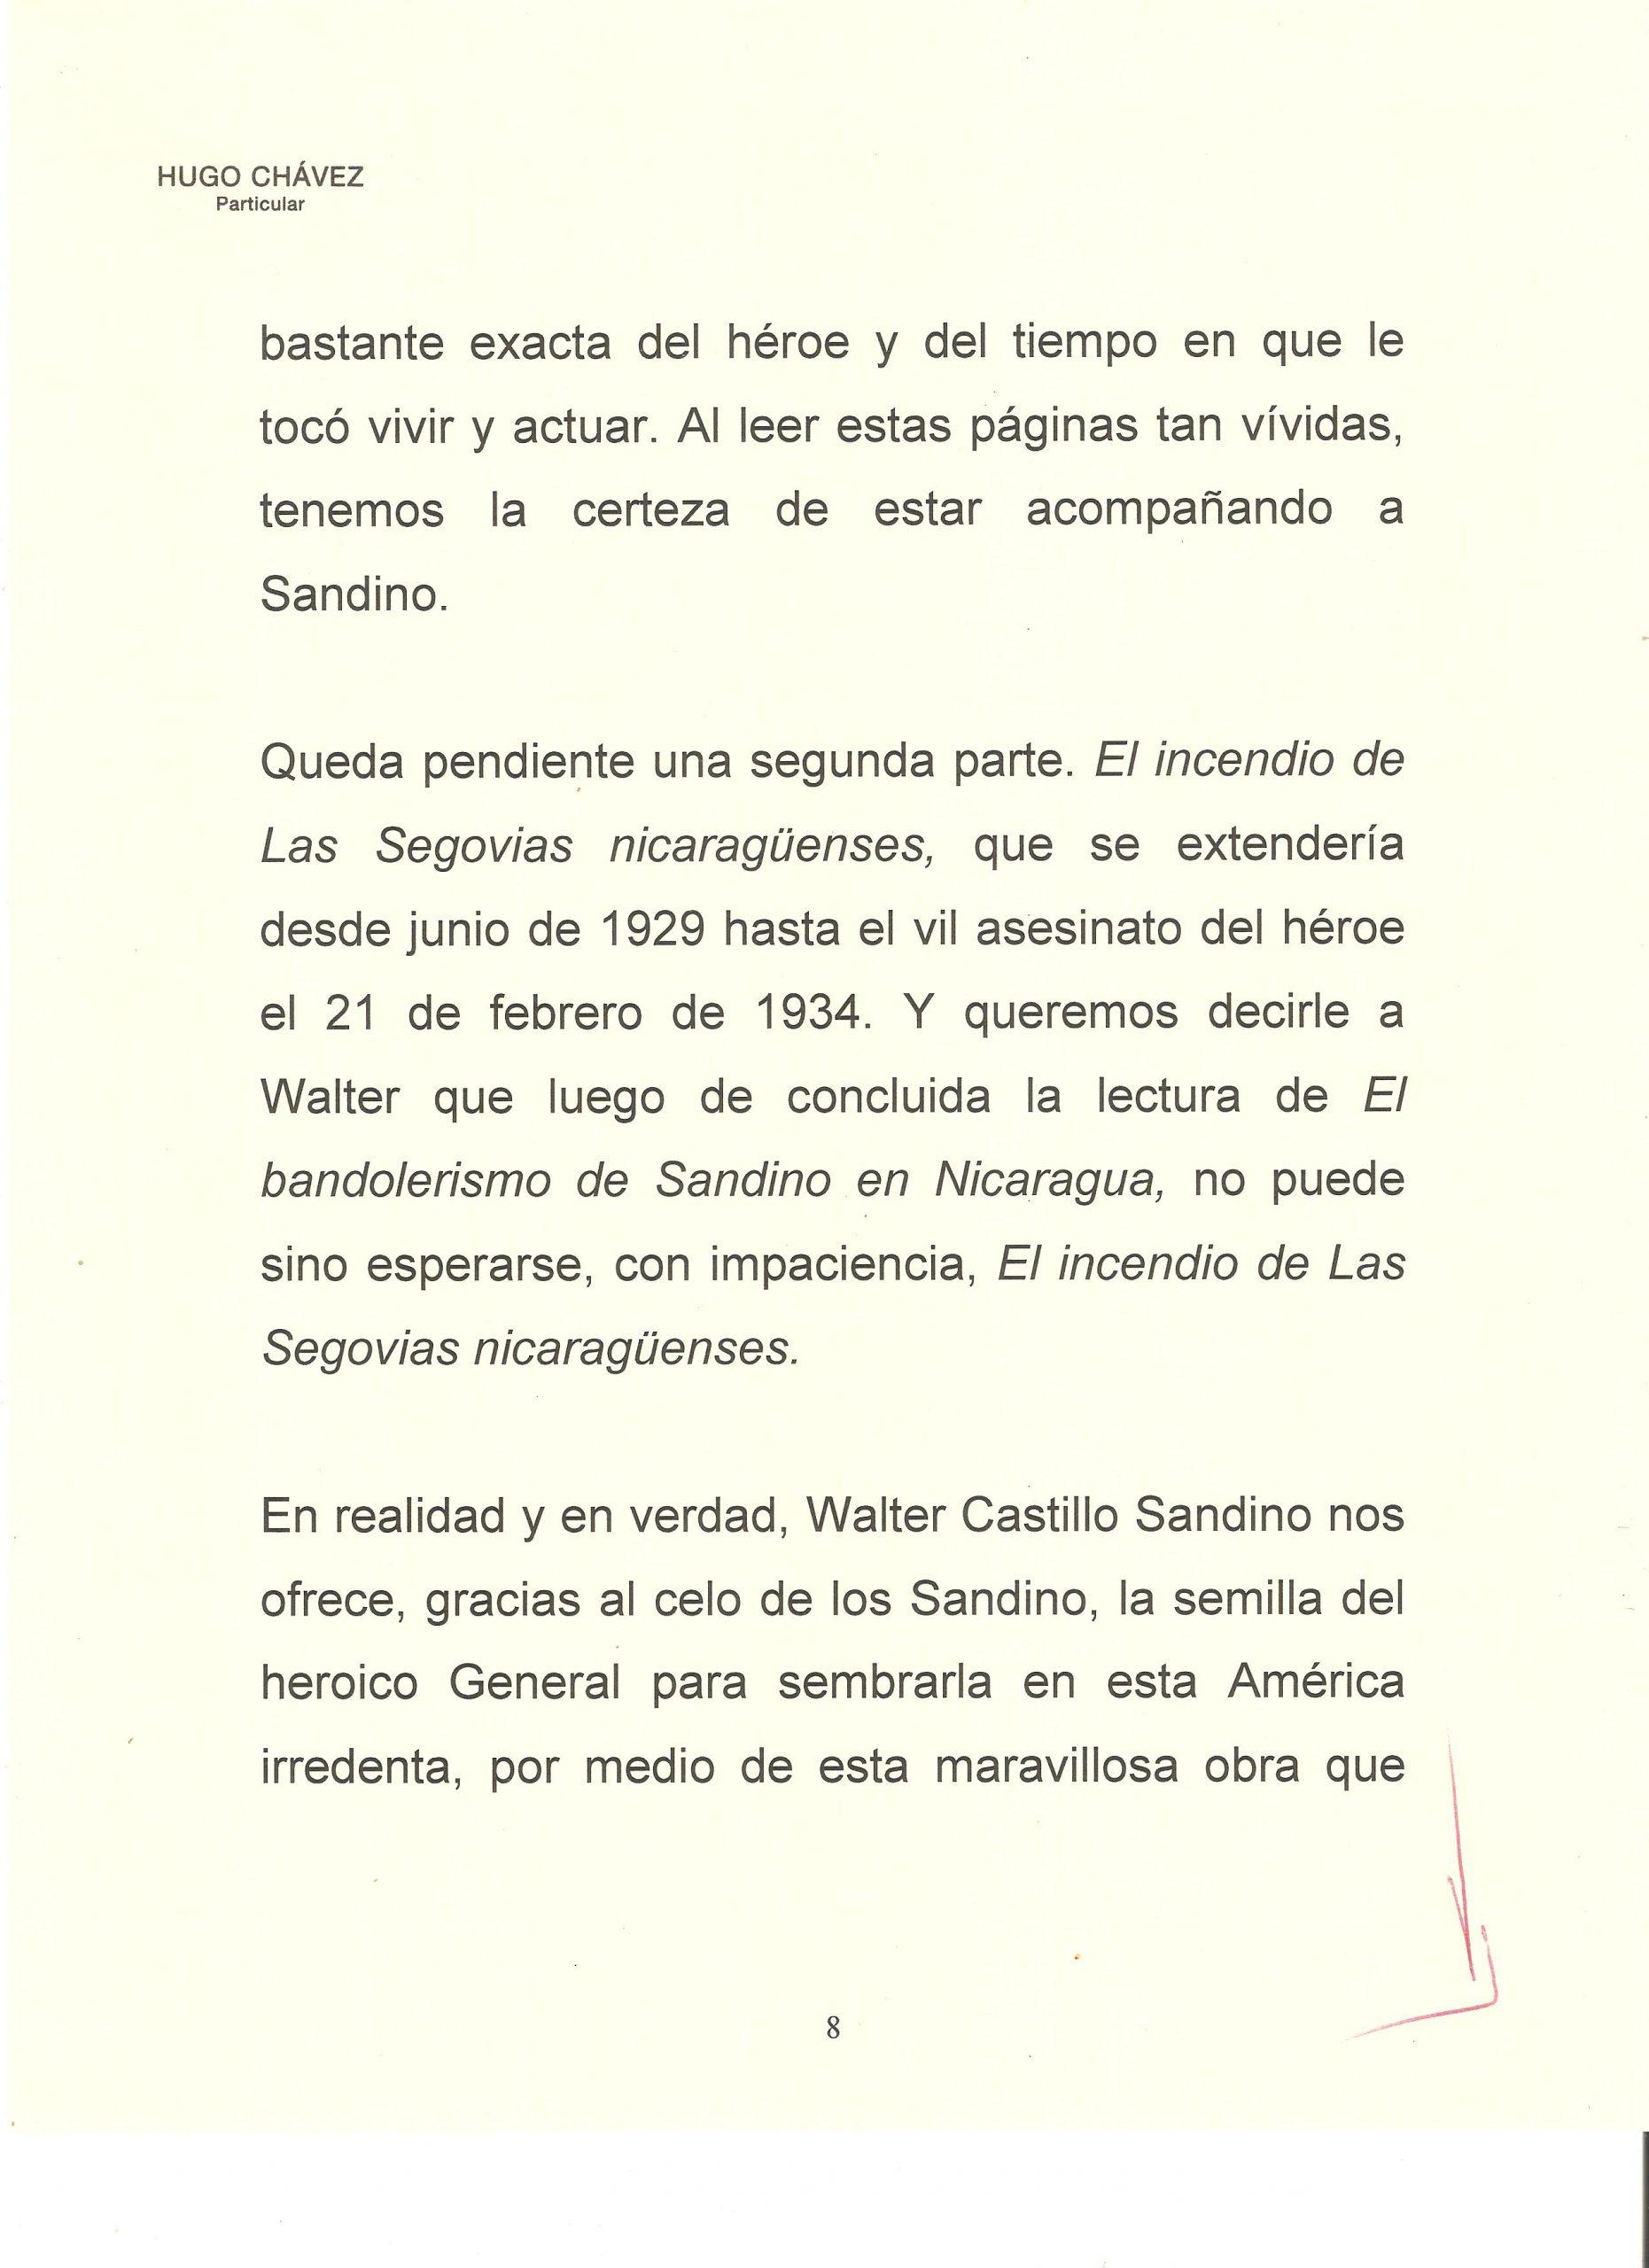 PROLOGO DE HUGO CHAVEZ A WALTER 8